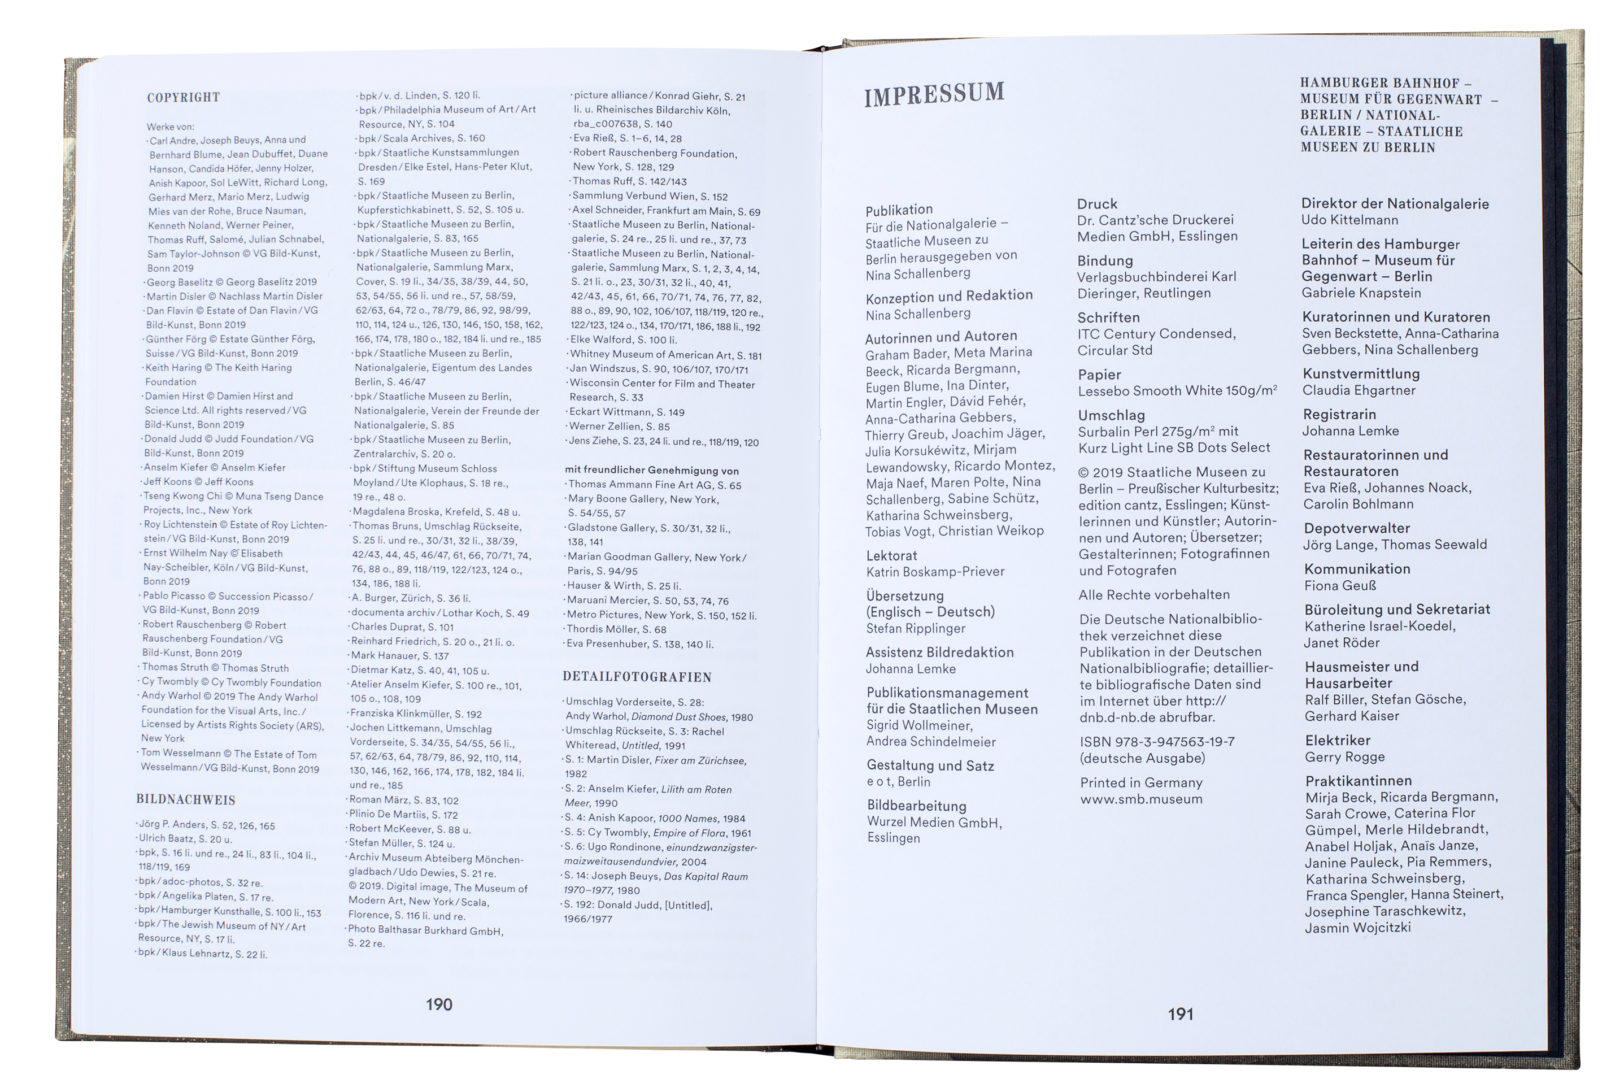 http://e-o-t.de/wordpress/wp-content/uploads/2020/06/Books-Marx-eot21.jpg